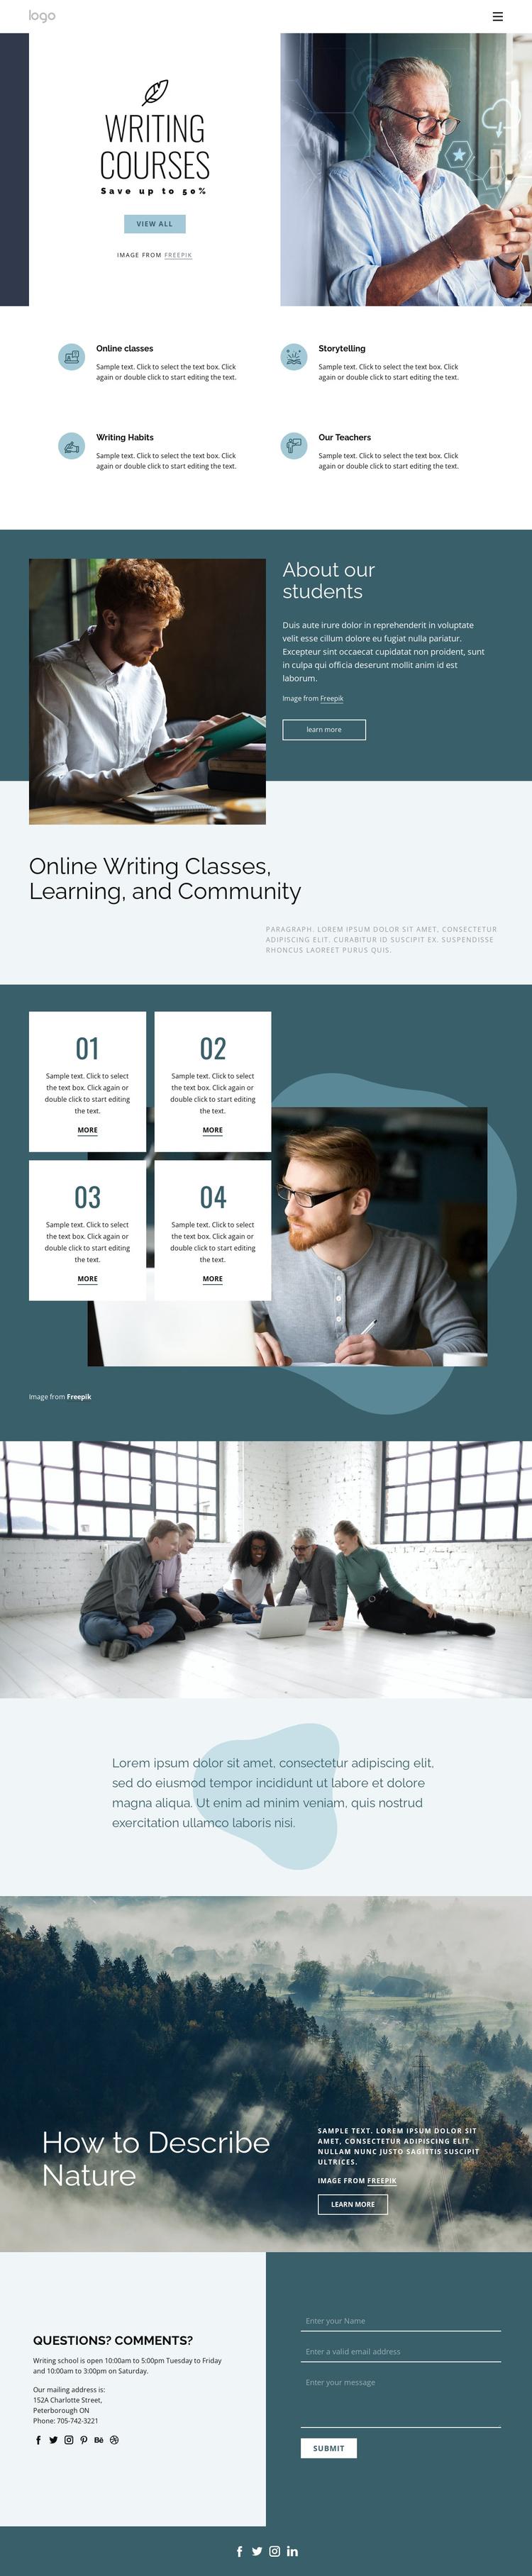 Creative writing courses Joomla Template